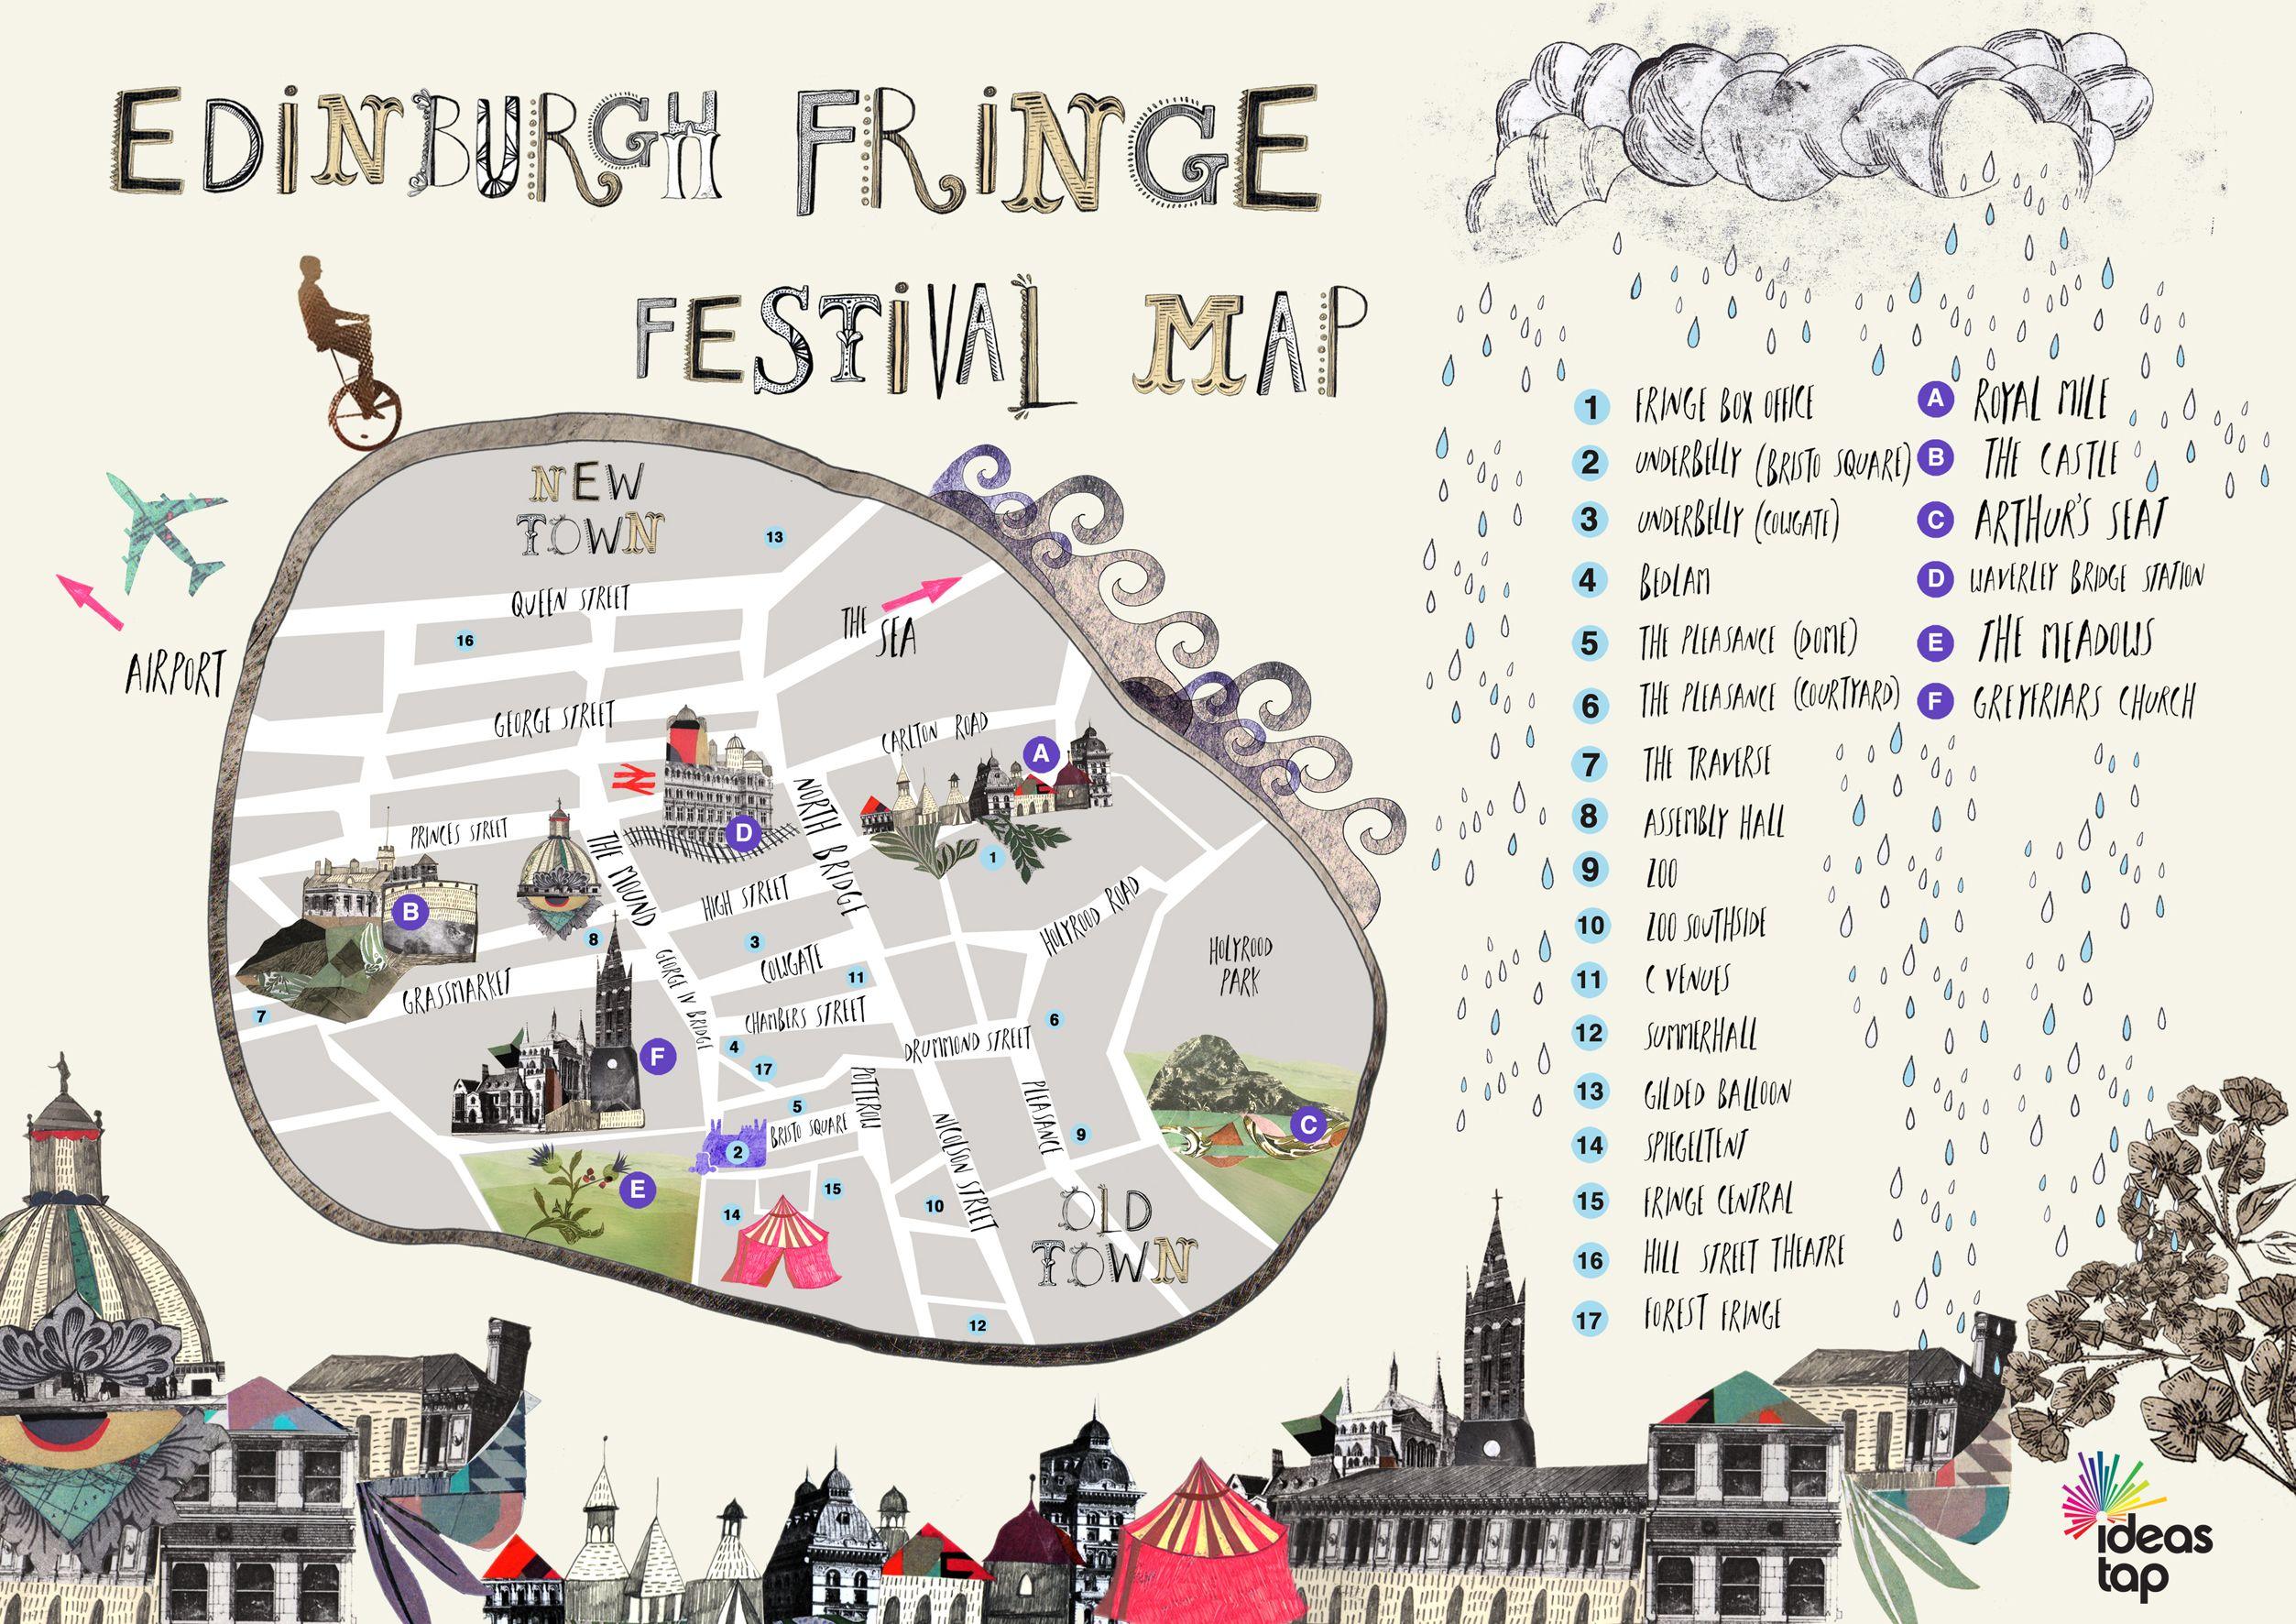 Edinburgh Fringe Map Edinburgh Fringe Fest Map | LSU in the UK & Ireland in 2019 | Map